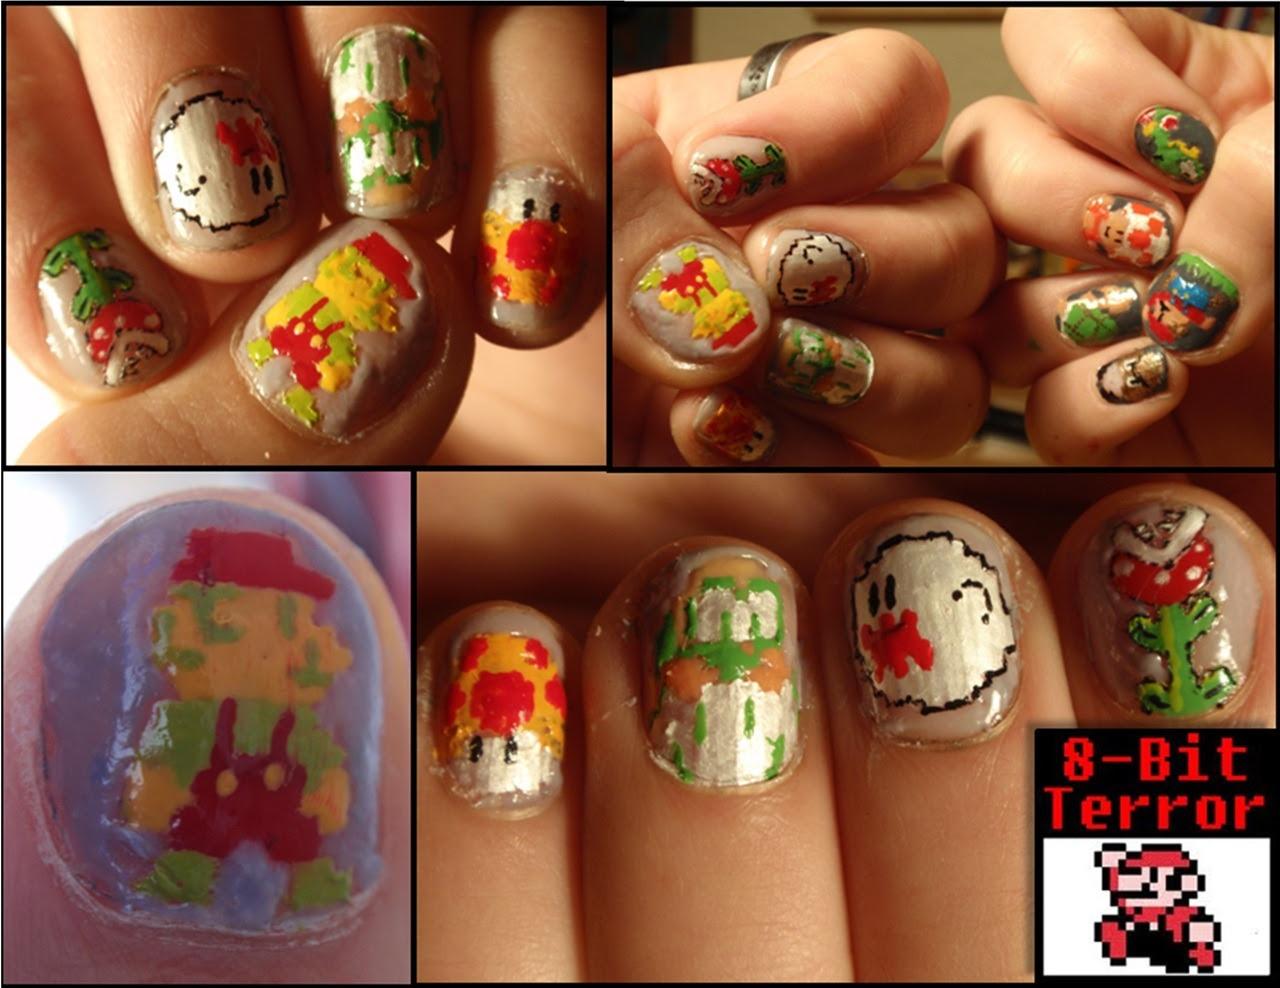 http://24.media.tumblr.com/tumblr_m7mpiyYBG71rpadk0o1_1280.jpg